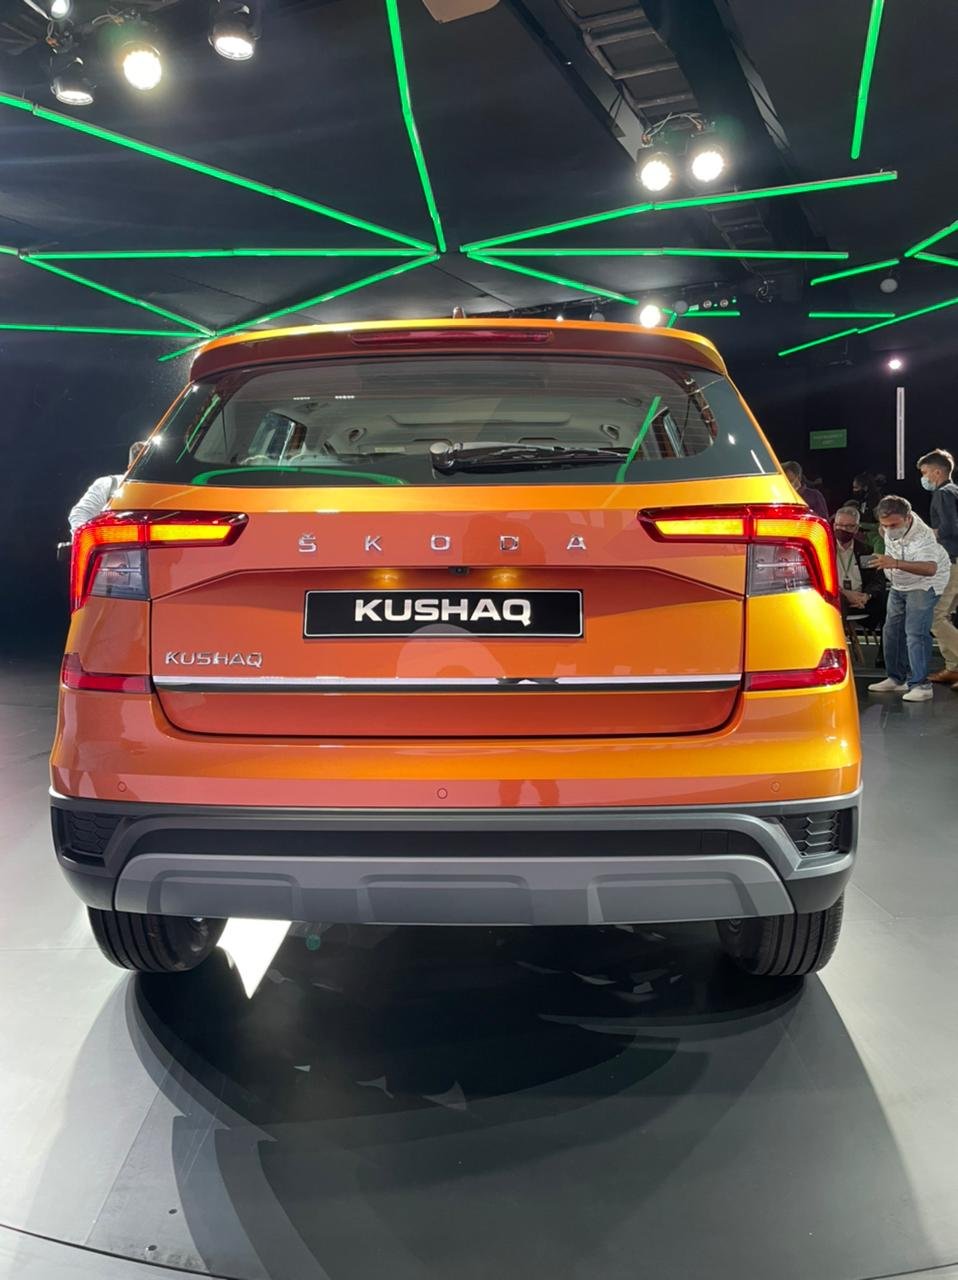 skoda-kushaq-first-look-review-exterior